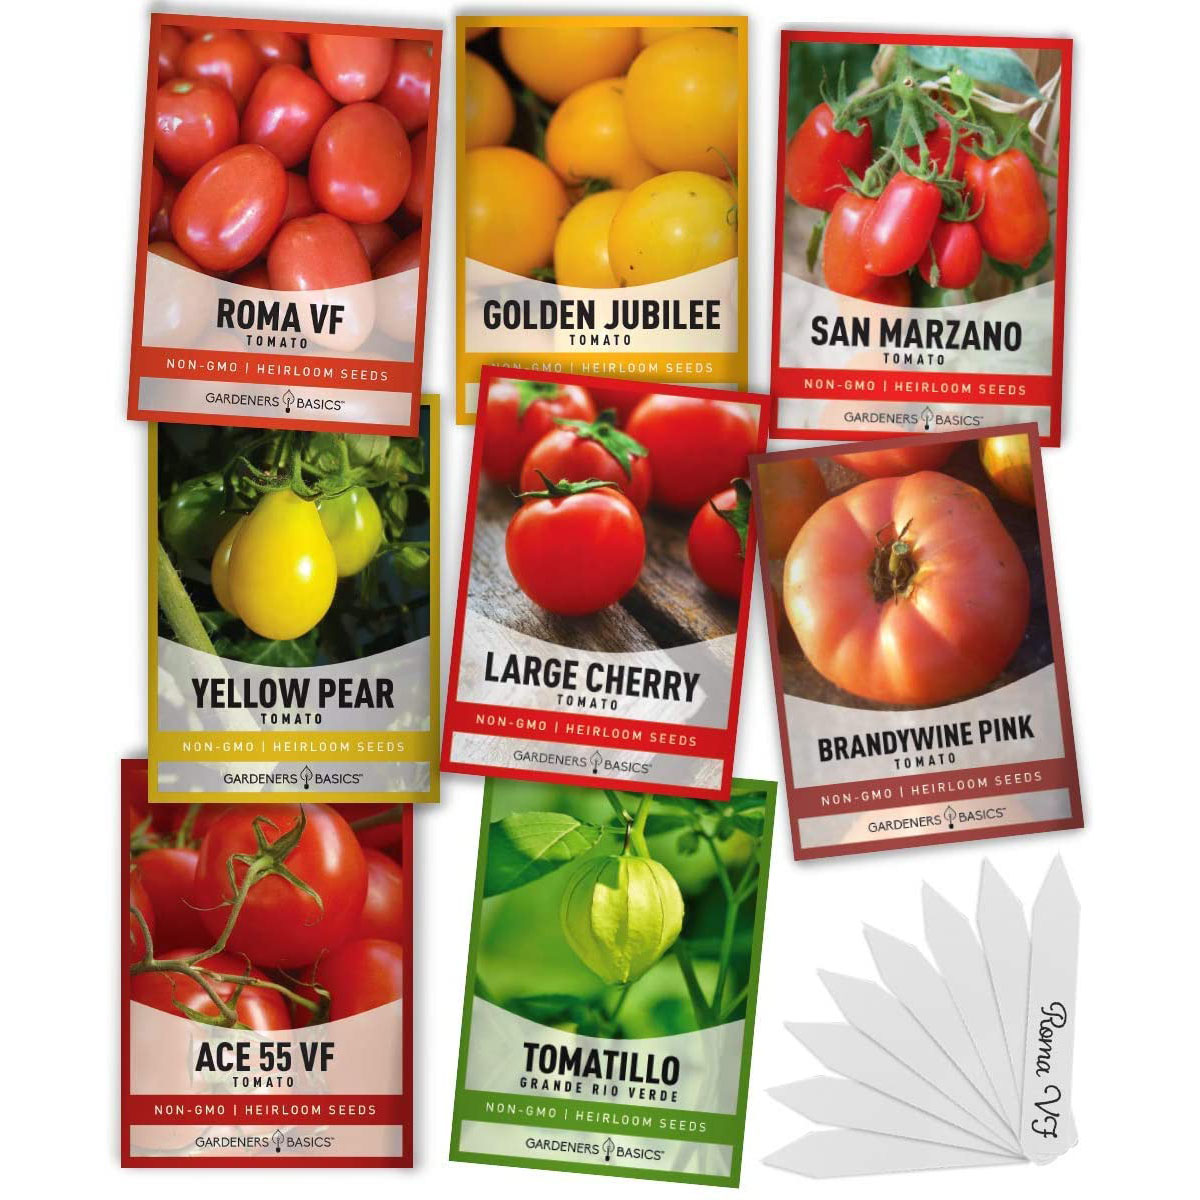 Gardeners Basics Heirloom Tomatoes for Planting